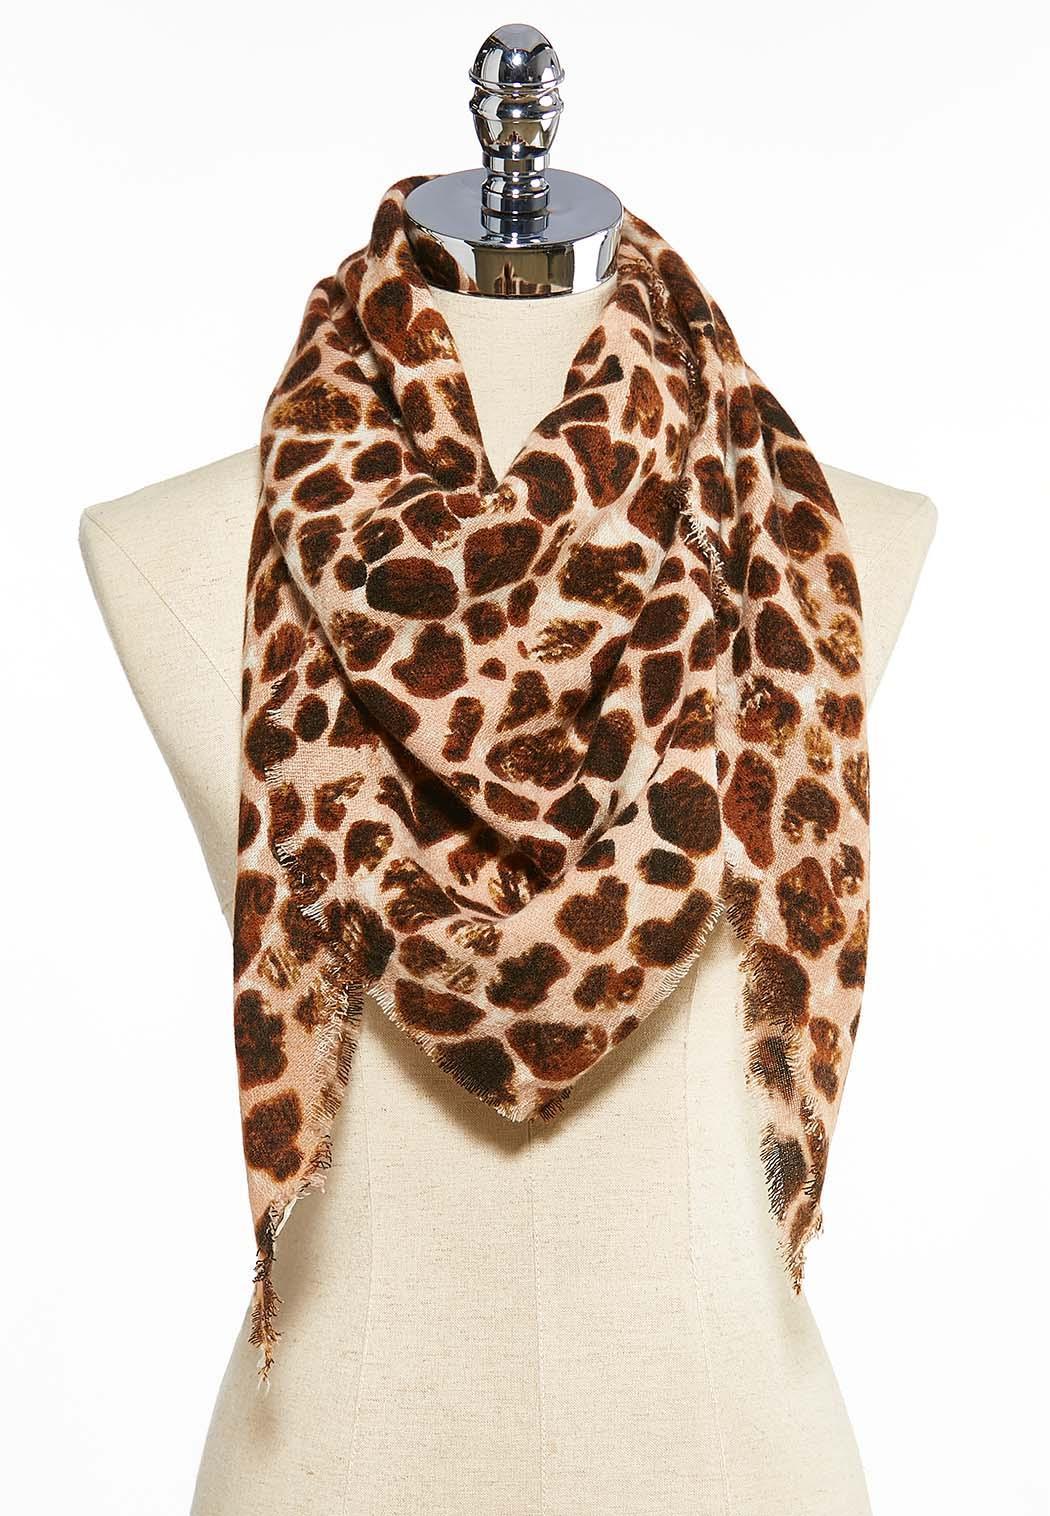 Snakey Leopard Triangle Scarf